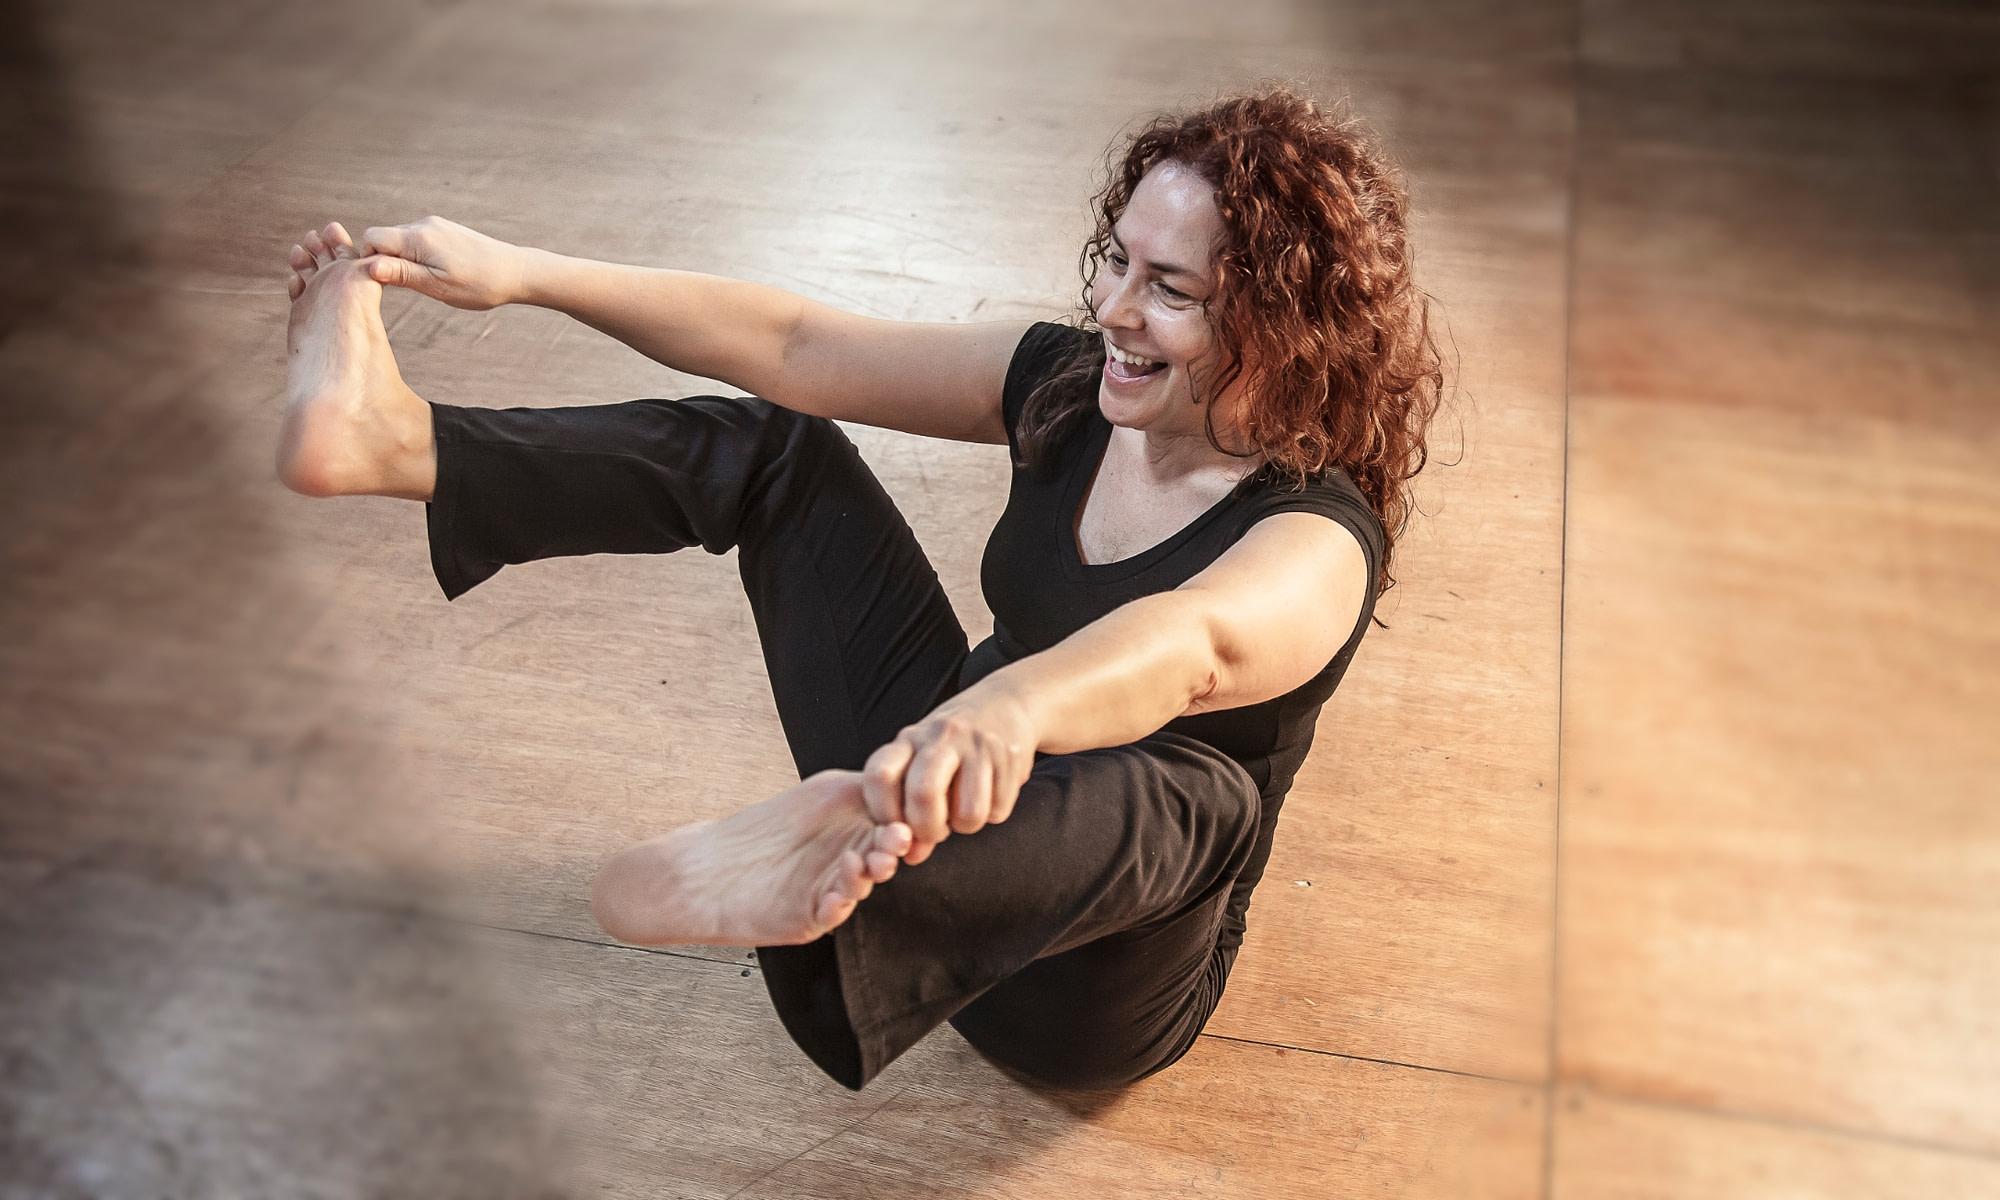 Potent flexibilty